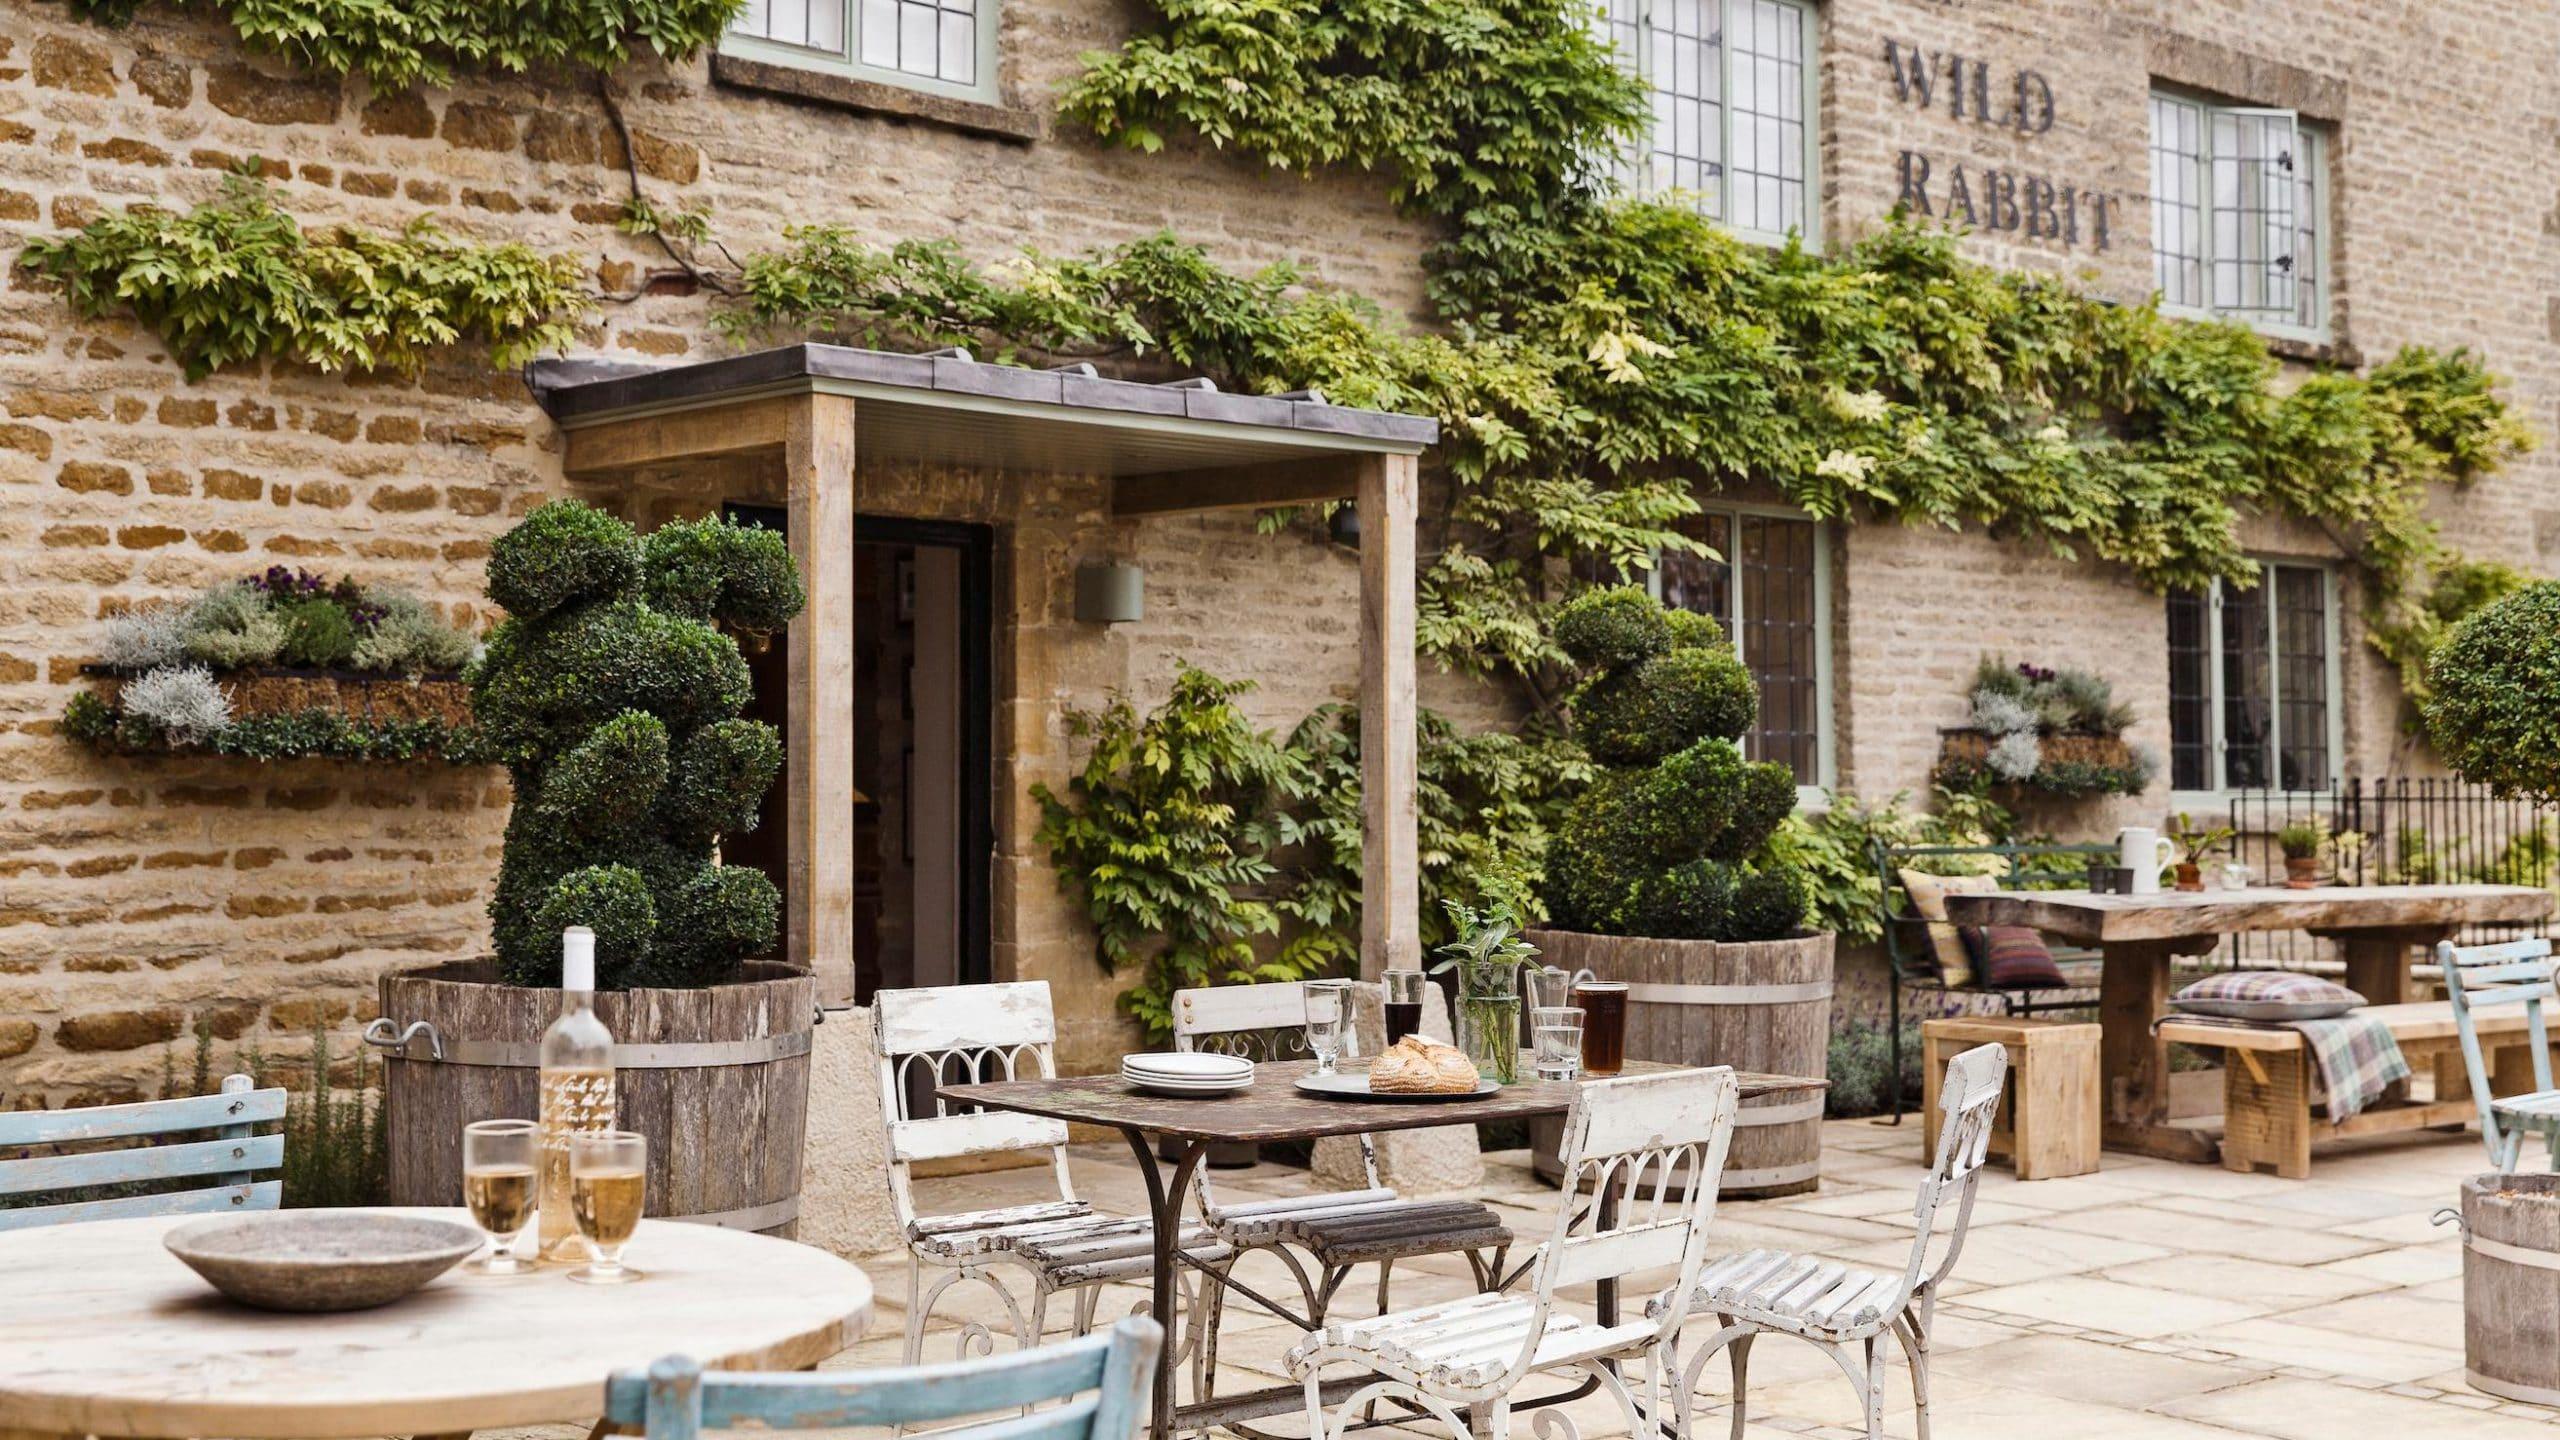 The-wild-rabbit-pub